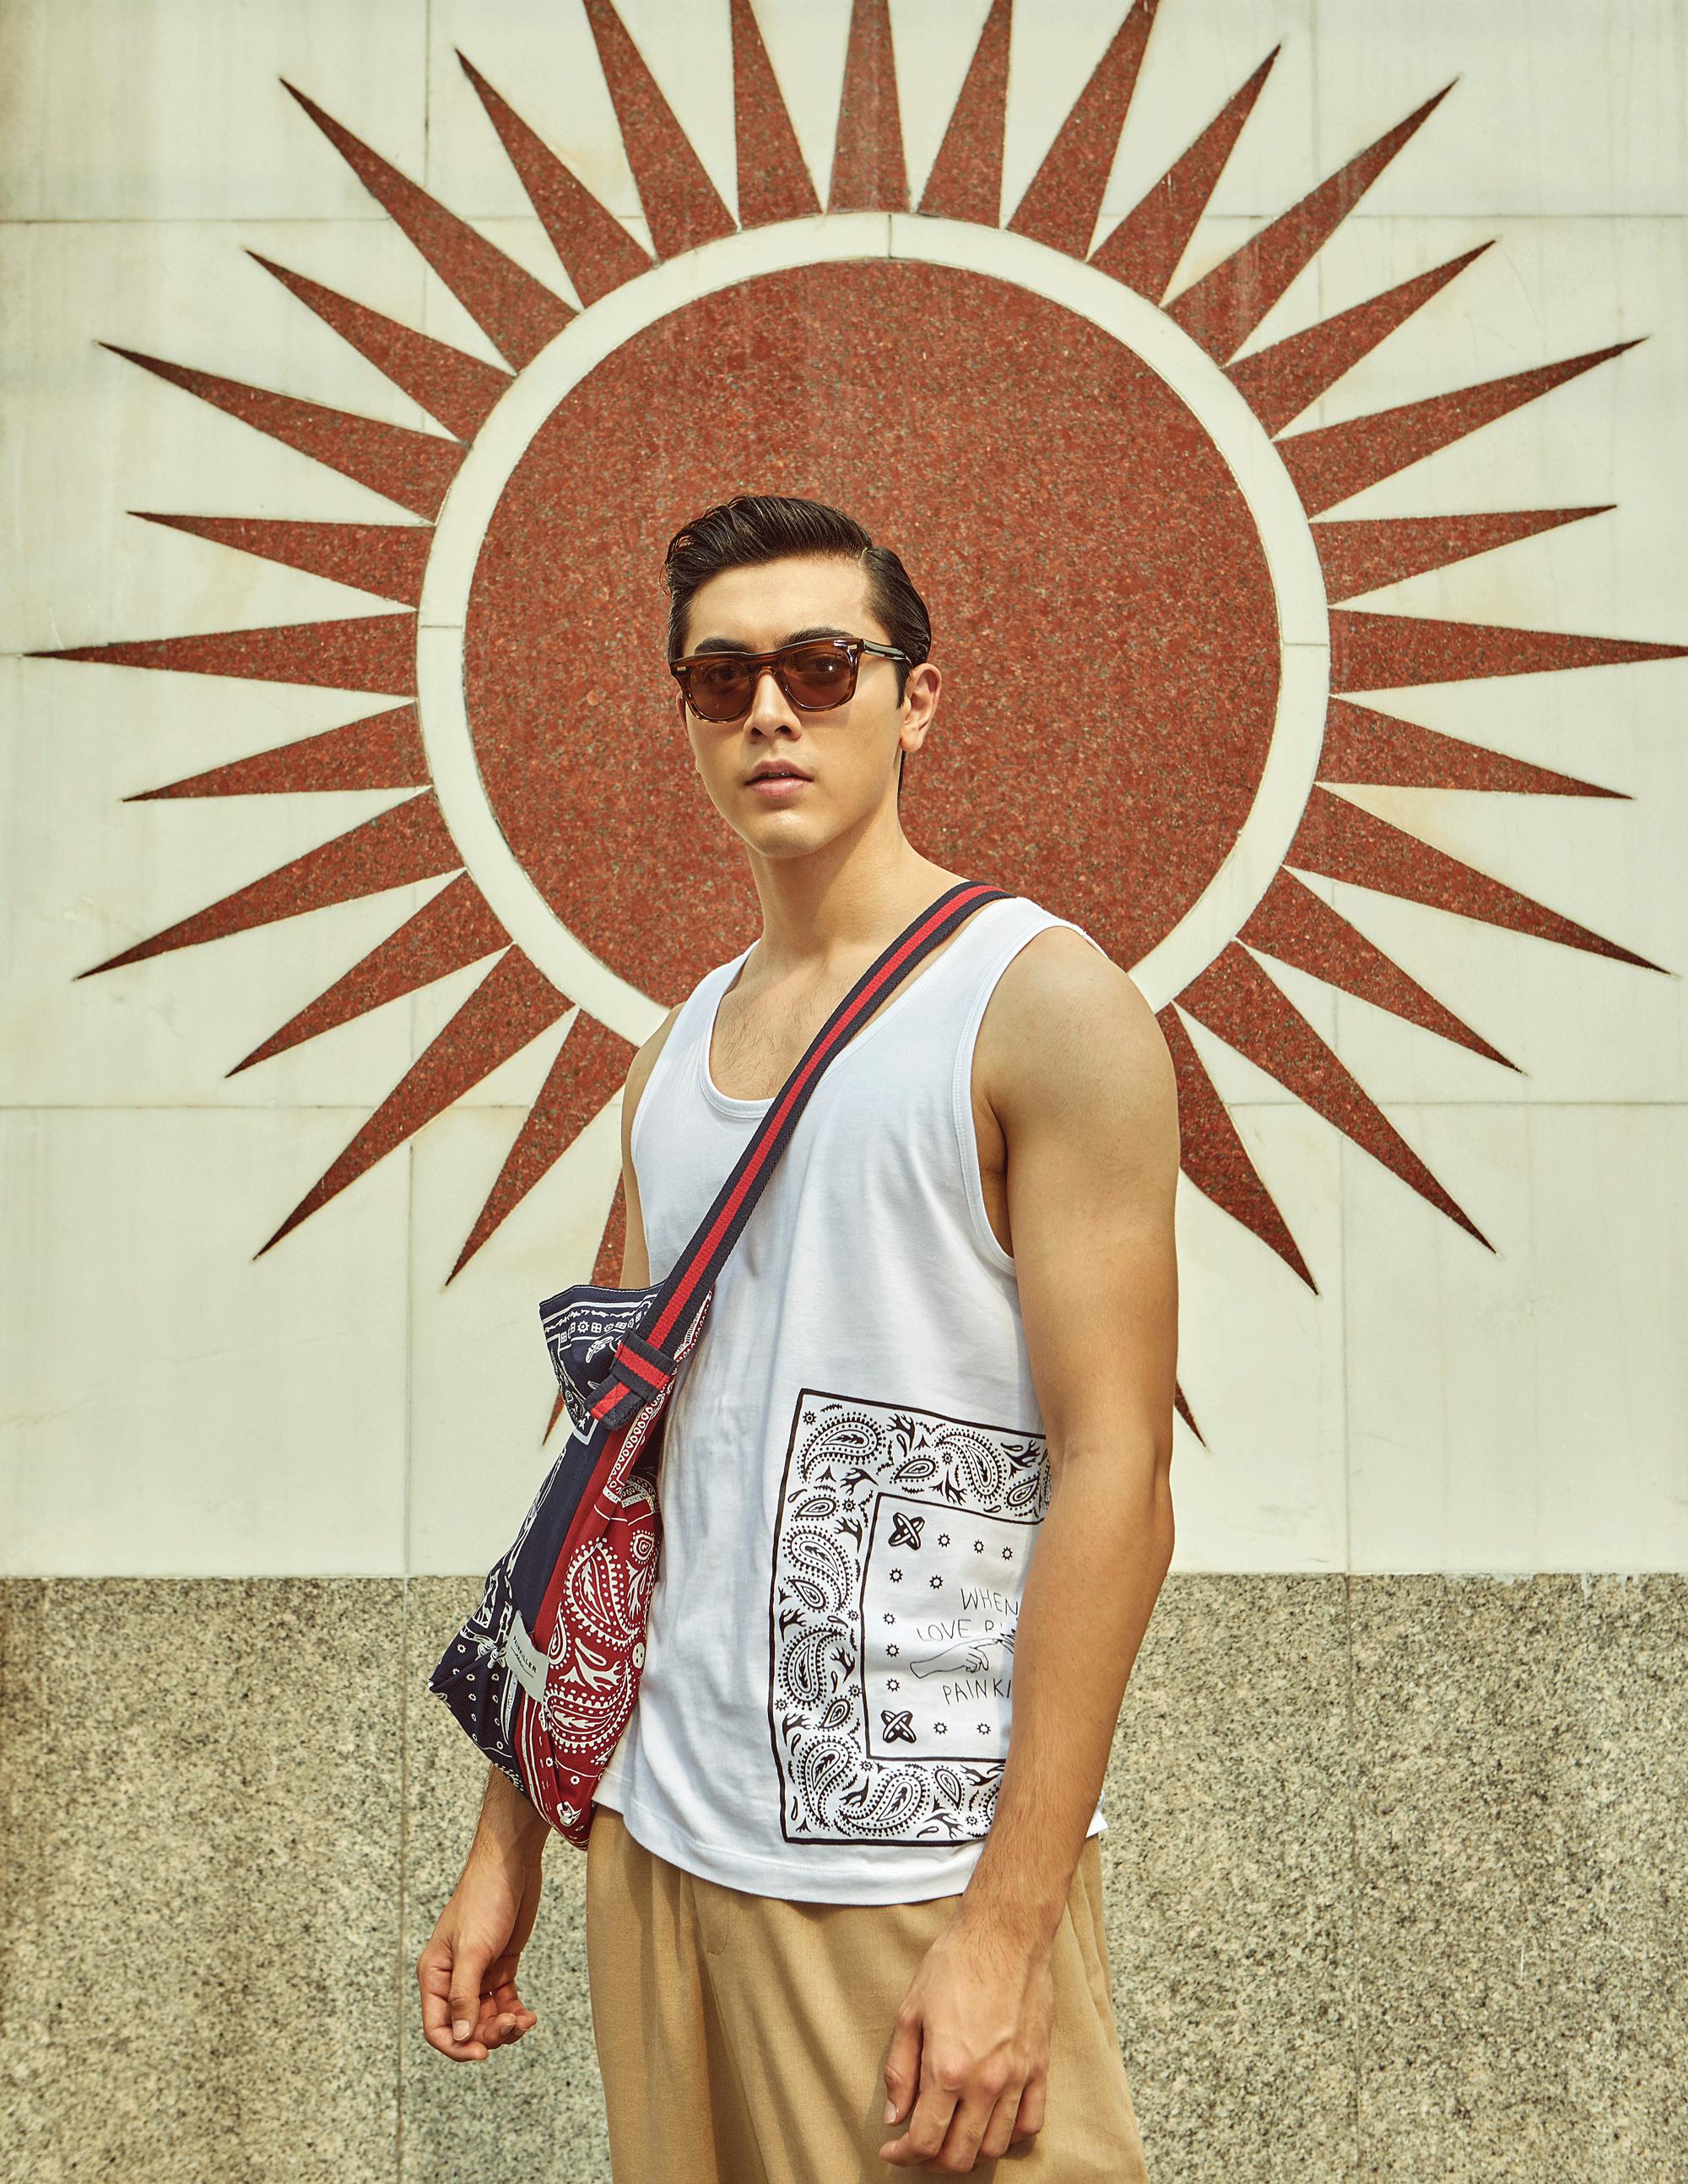 clothes and bag : PAINKILLER / sunglasses : Blake Kuwahara